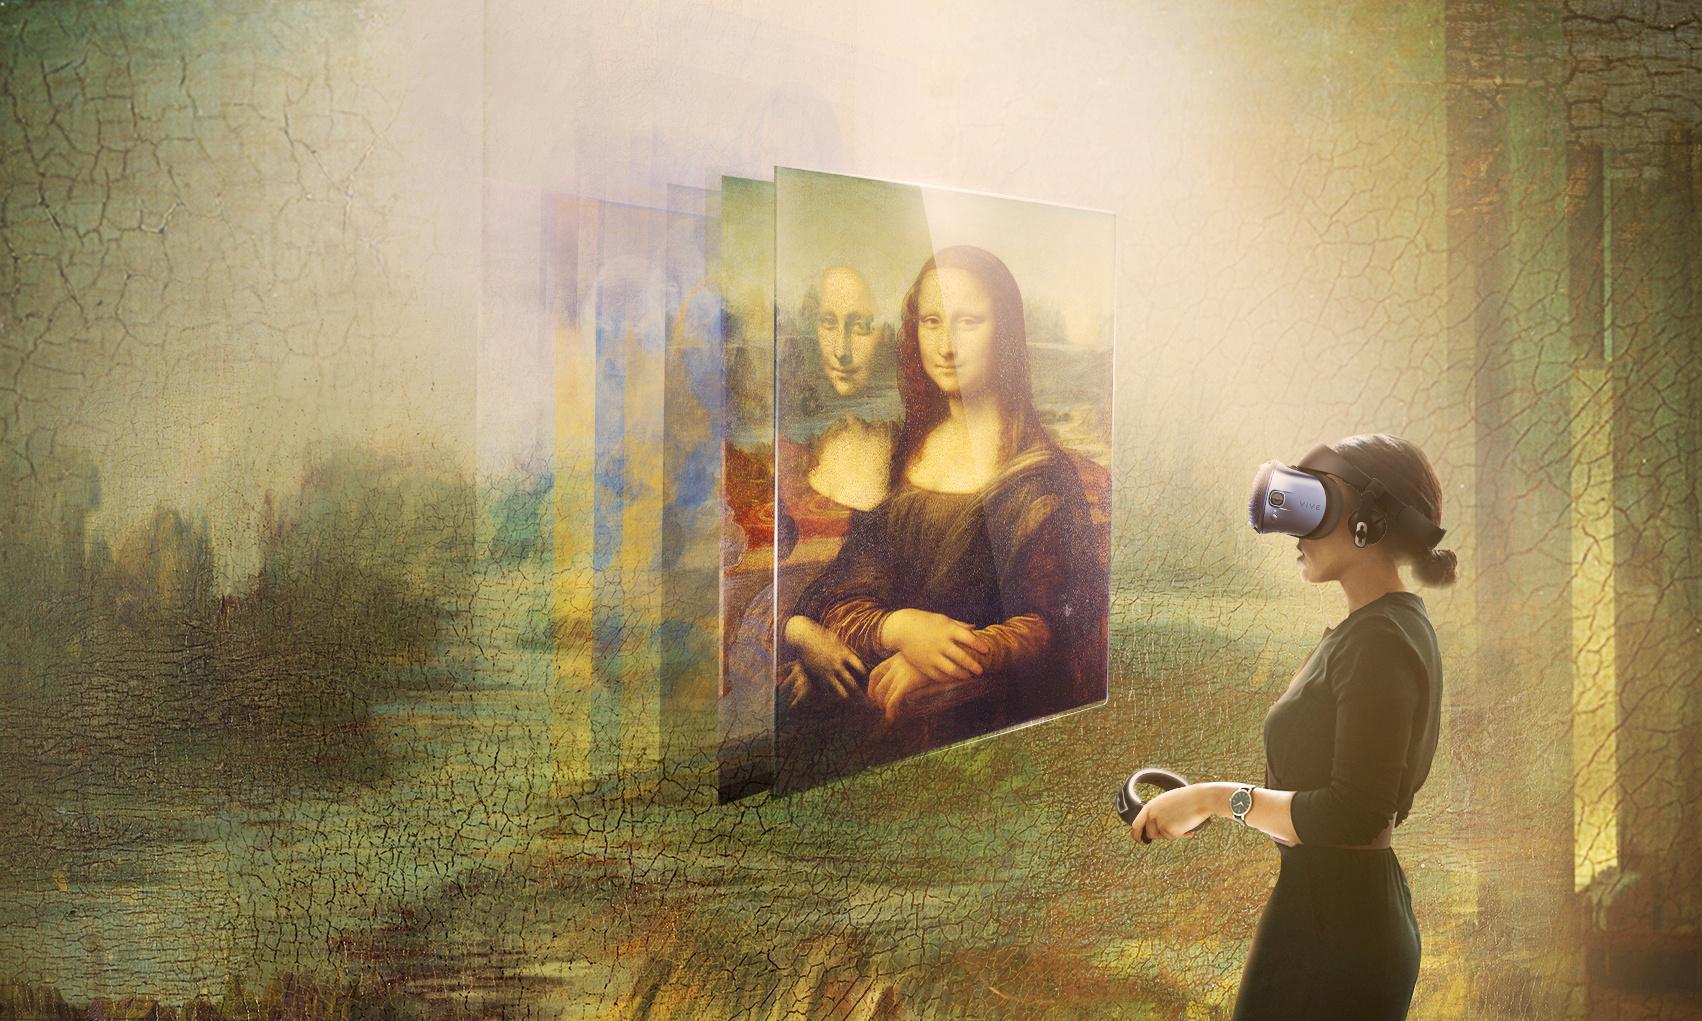 More than Mona Lisa: Louvre's Leonardo da Vinci is a blockbuster with brains